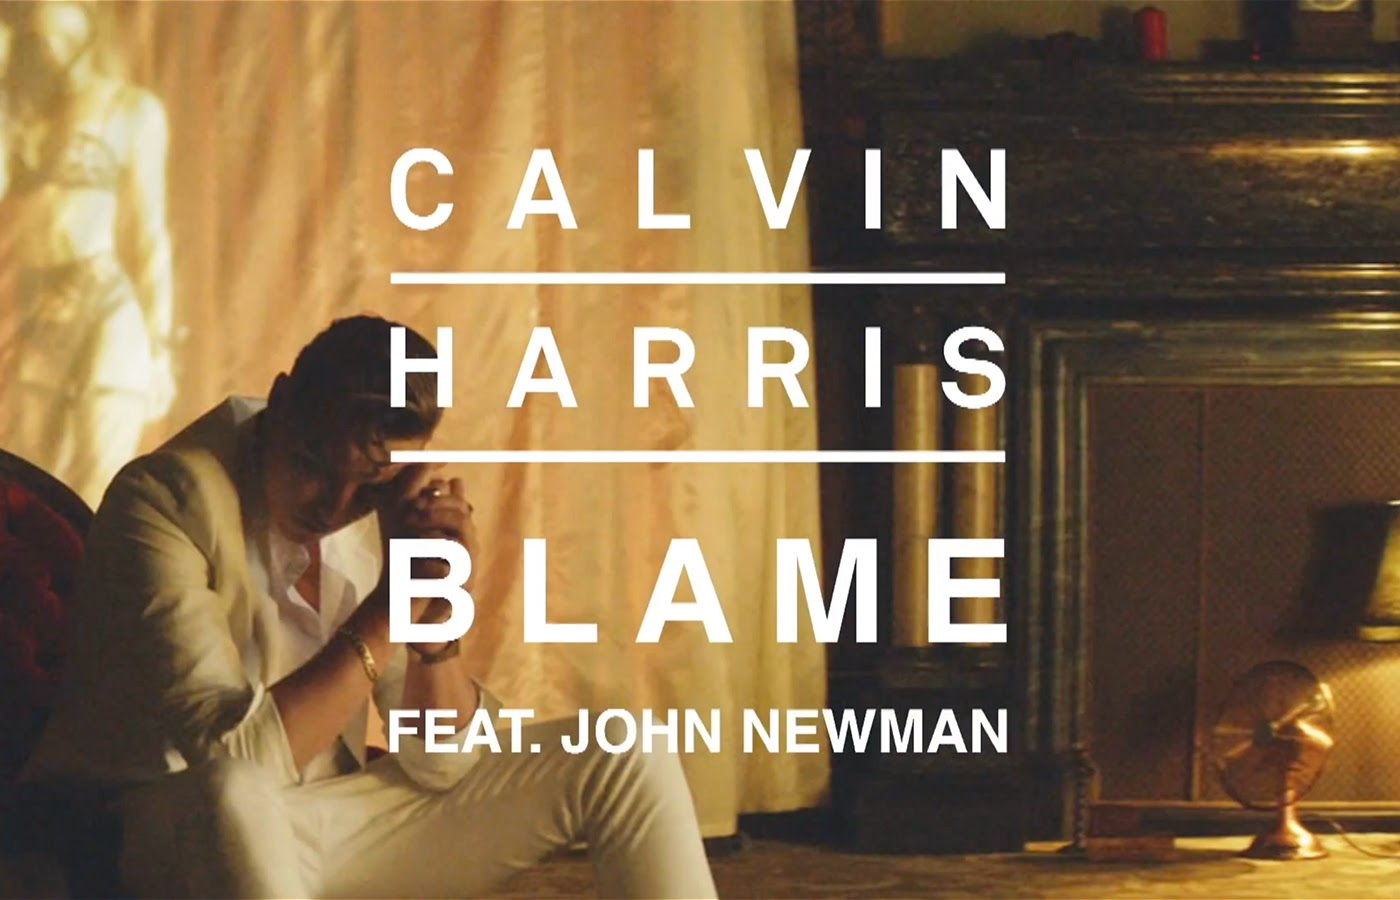 Calvin Harris - Blame (Feat. John Newman) | Excited Octopus